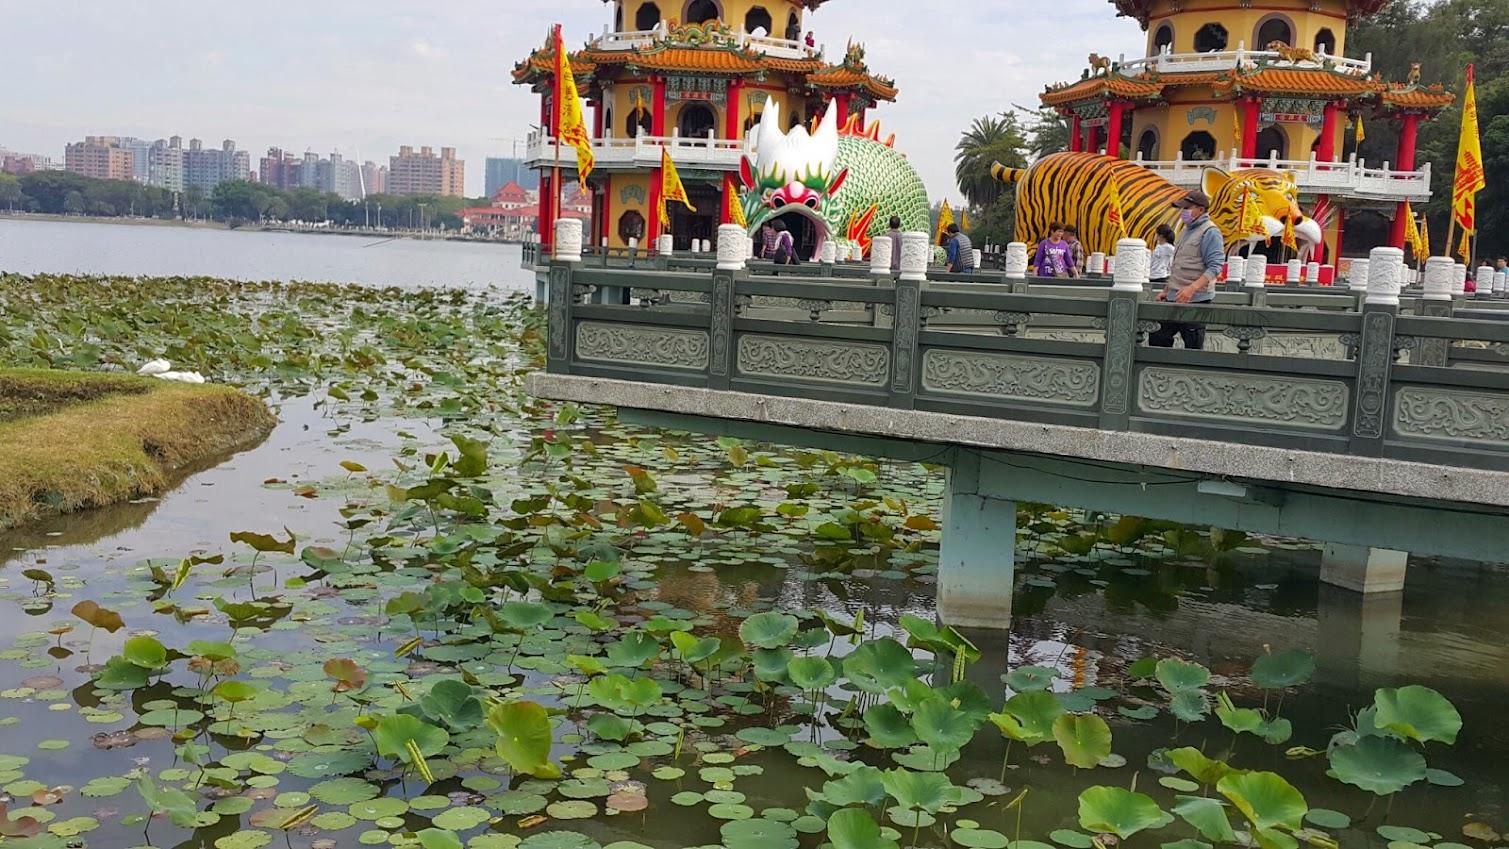 Lotus at the Love river in Taiwan